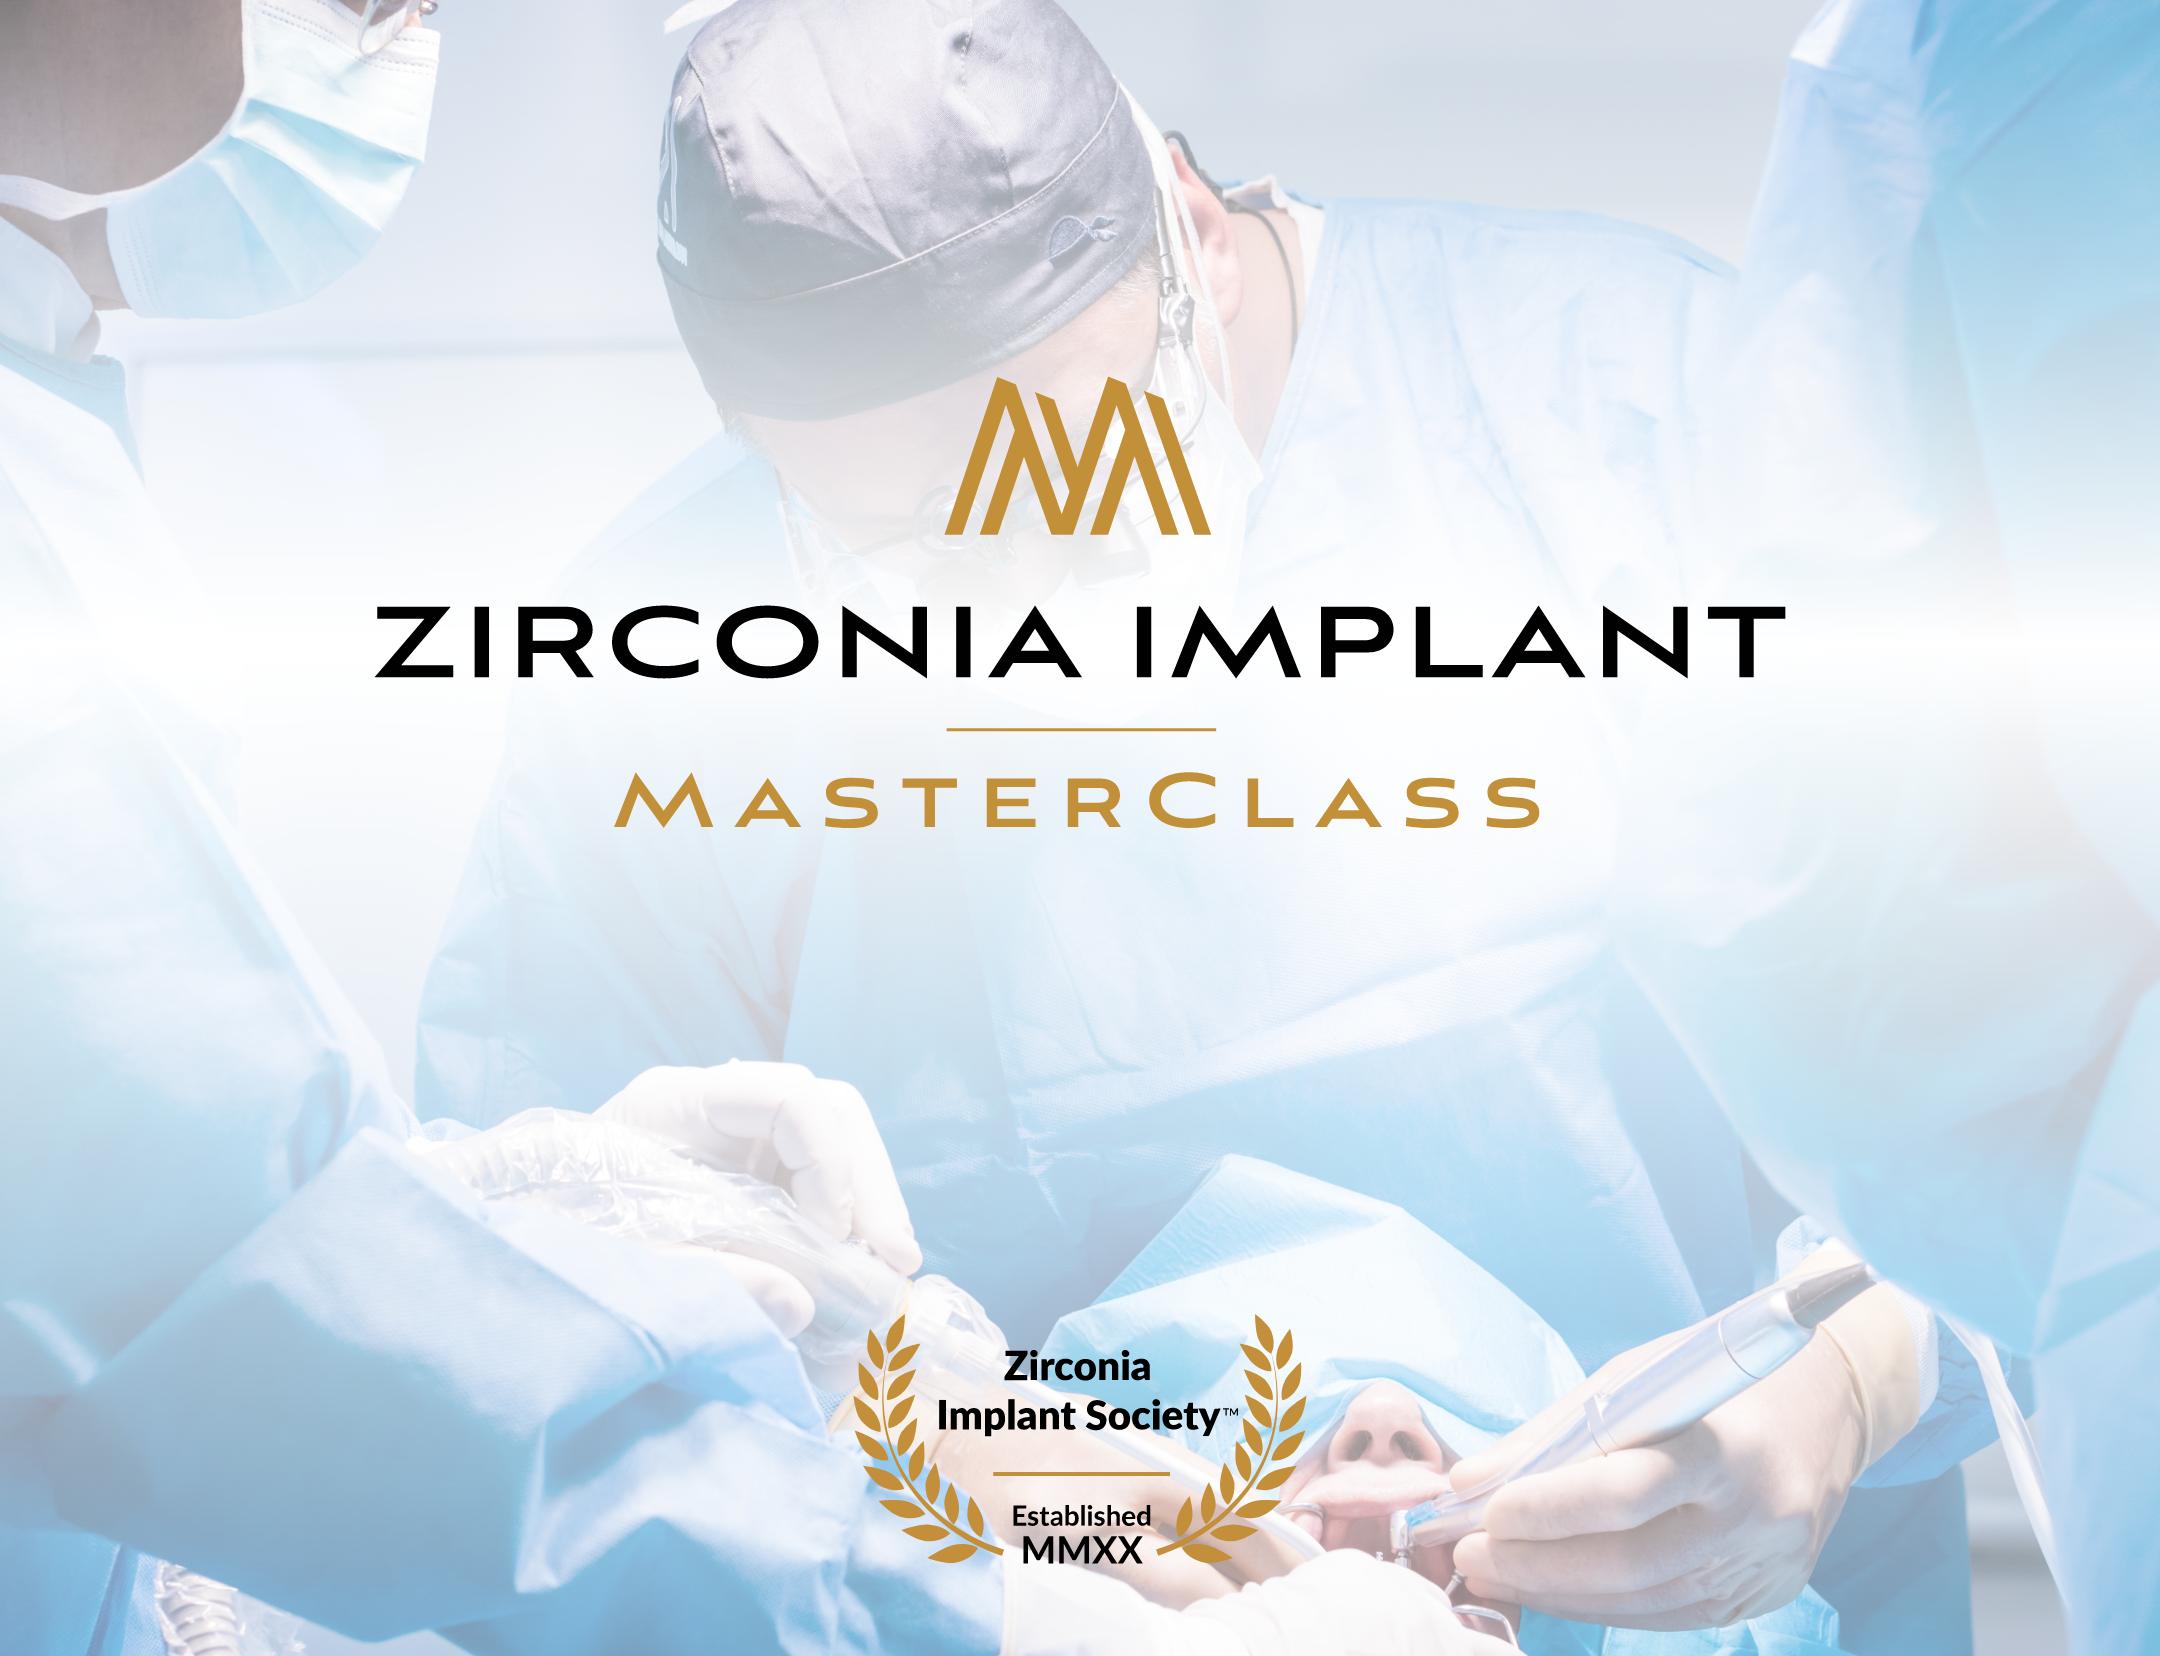 zirconia-implant-masterclass-logo